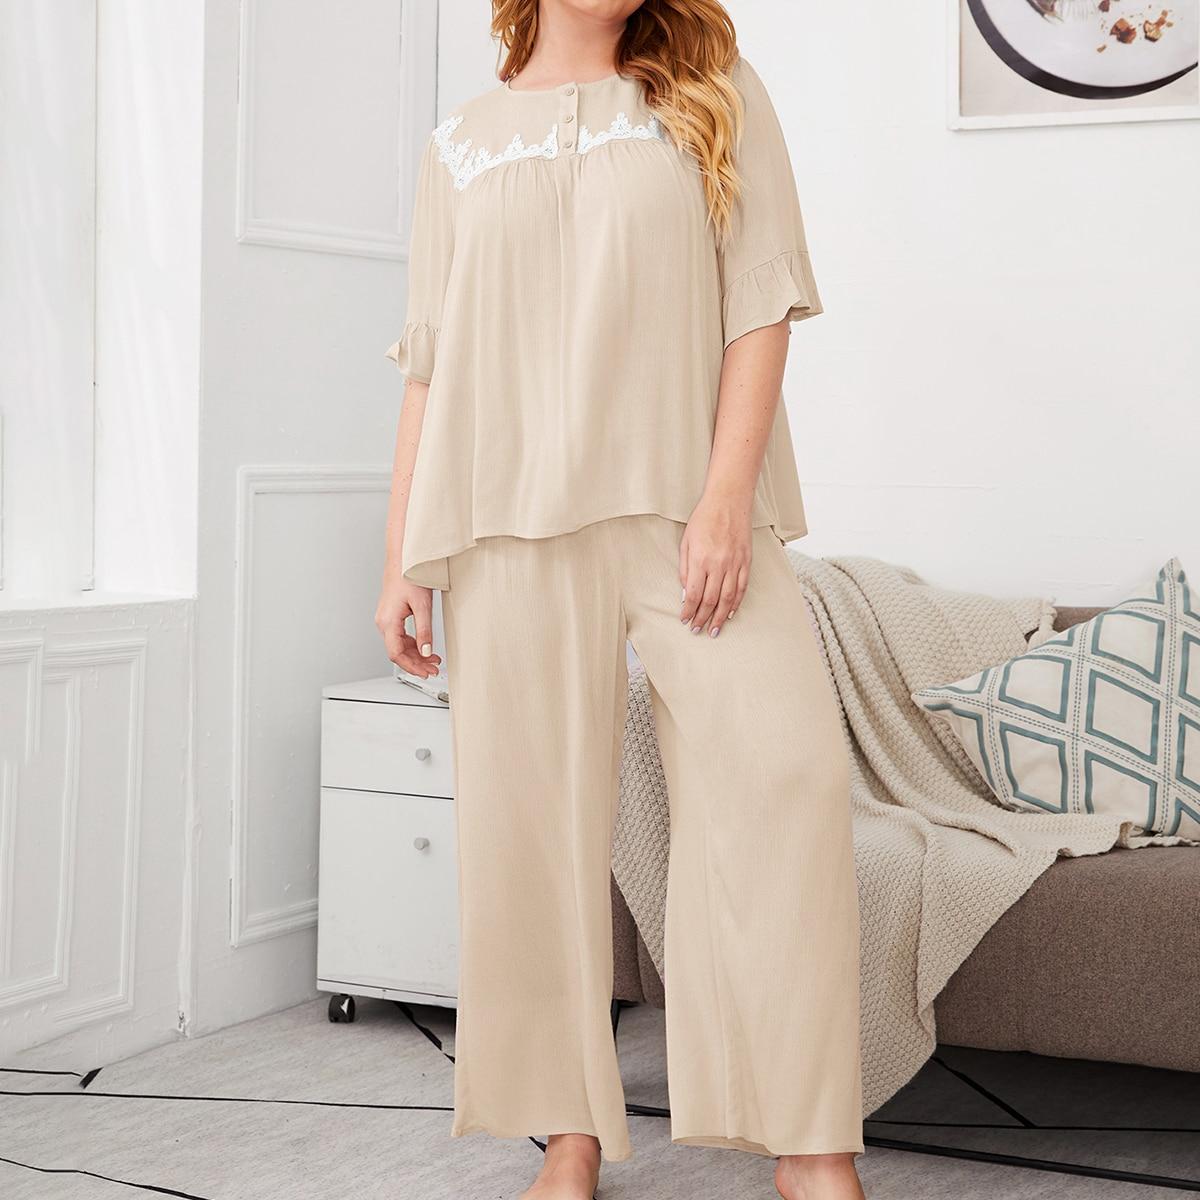 shein Beige Schattig Grote maten pyjama sets Rimpeling